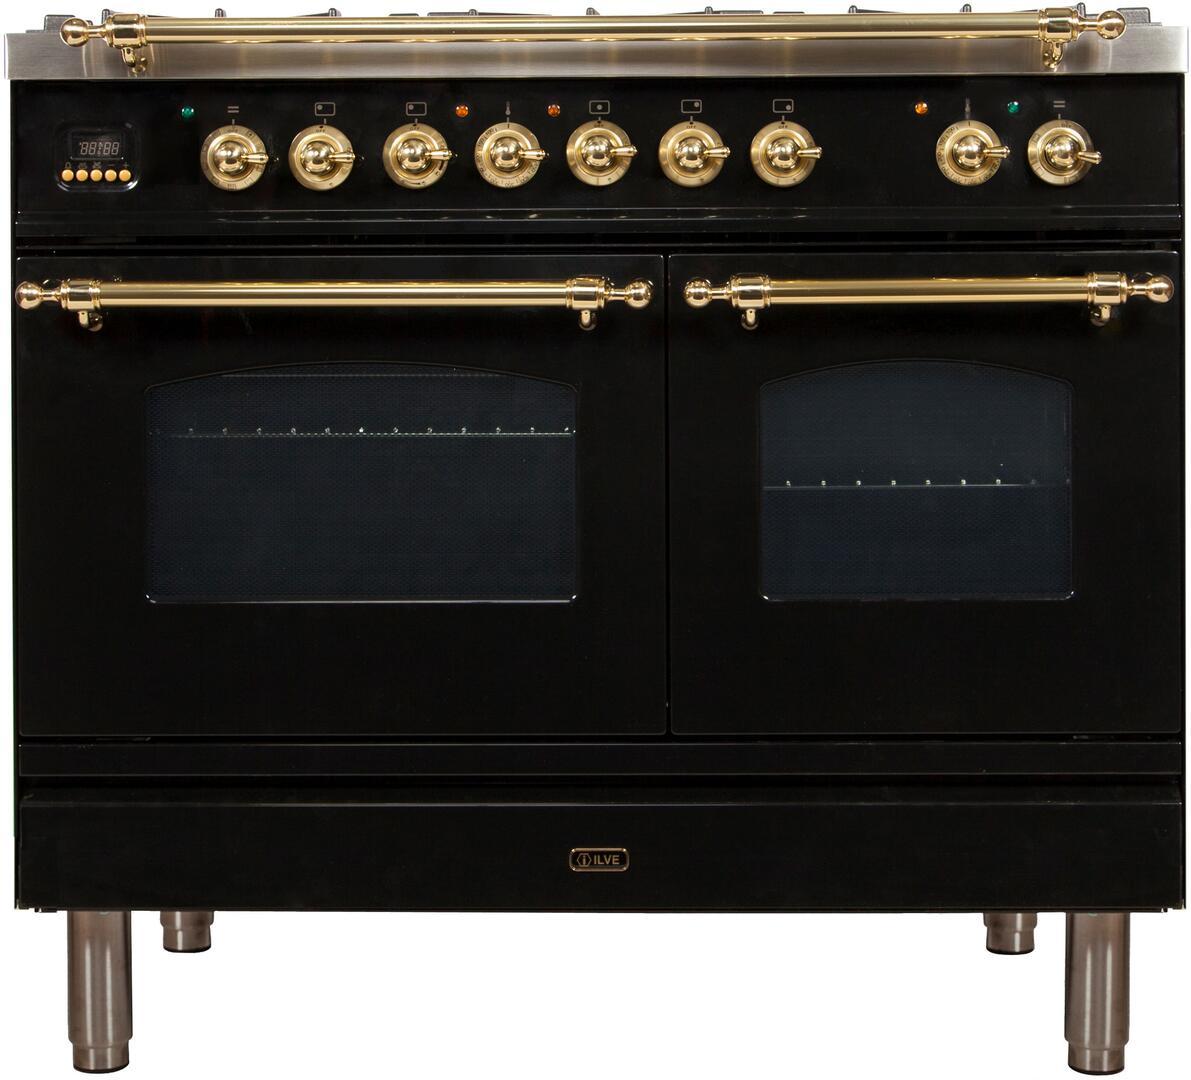 Ilve Nostalgie UPDN100FDMPNLP Freestanding Dual Fuel Range Black, UPDN100FDMPNLP Front View